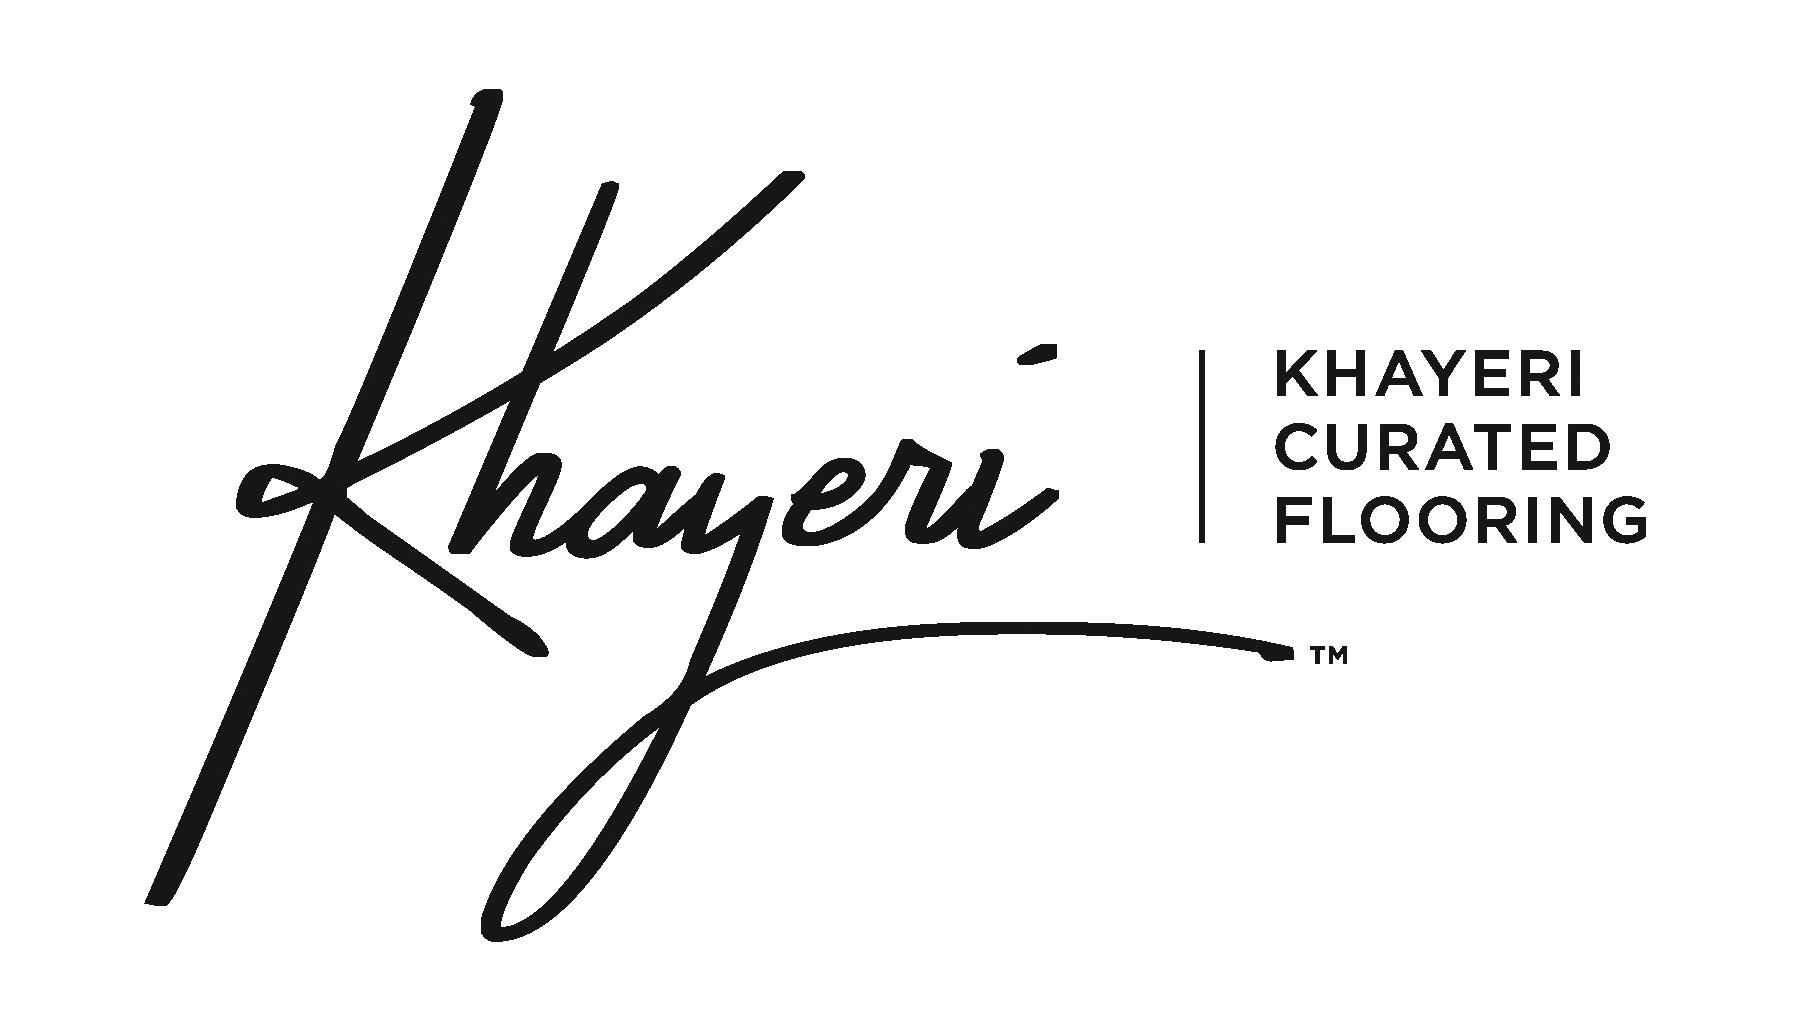 Khayeri presents 2020 Interior Design Trends in Flooring